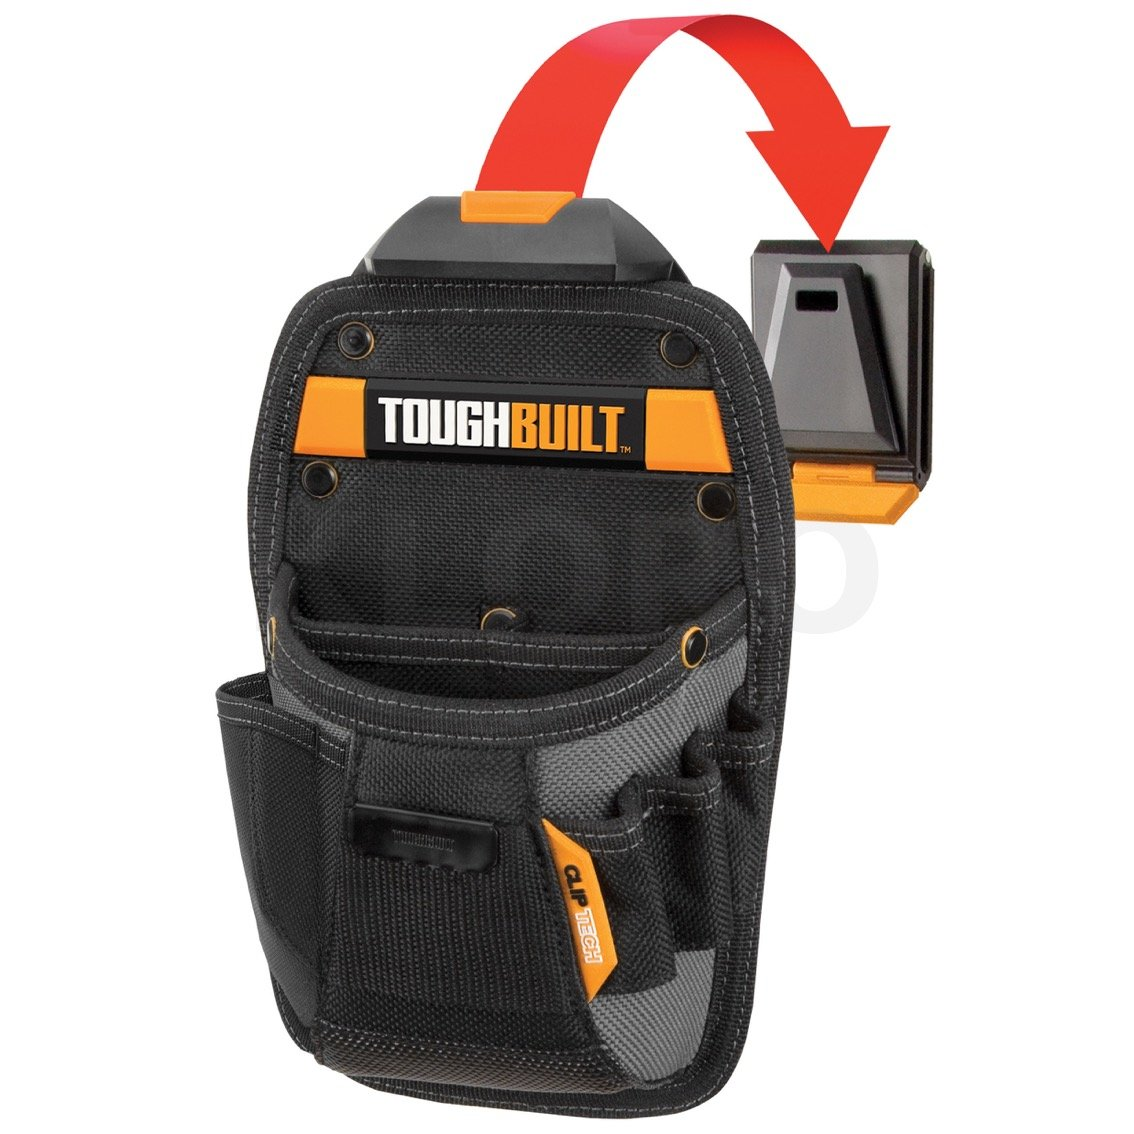 ToughBuilt tou-ct-26 Universal Pouch/Messertasche